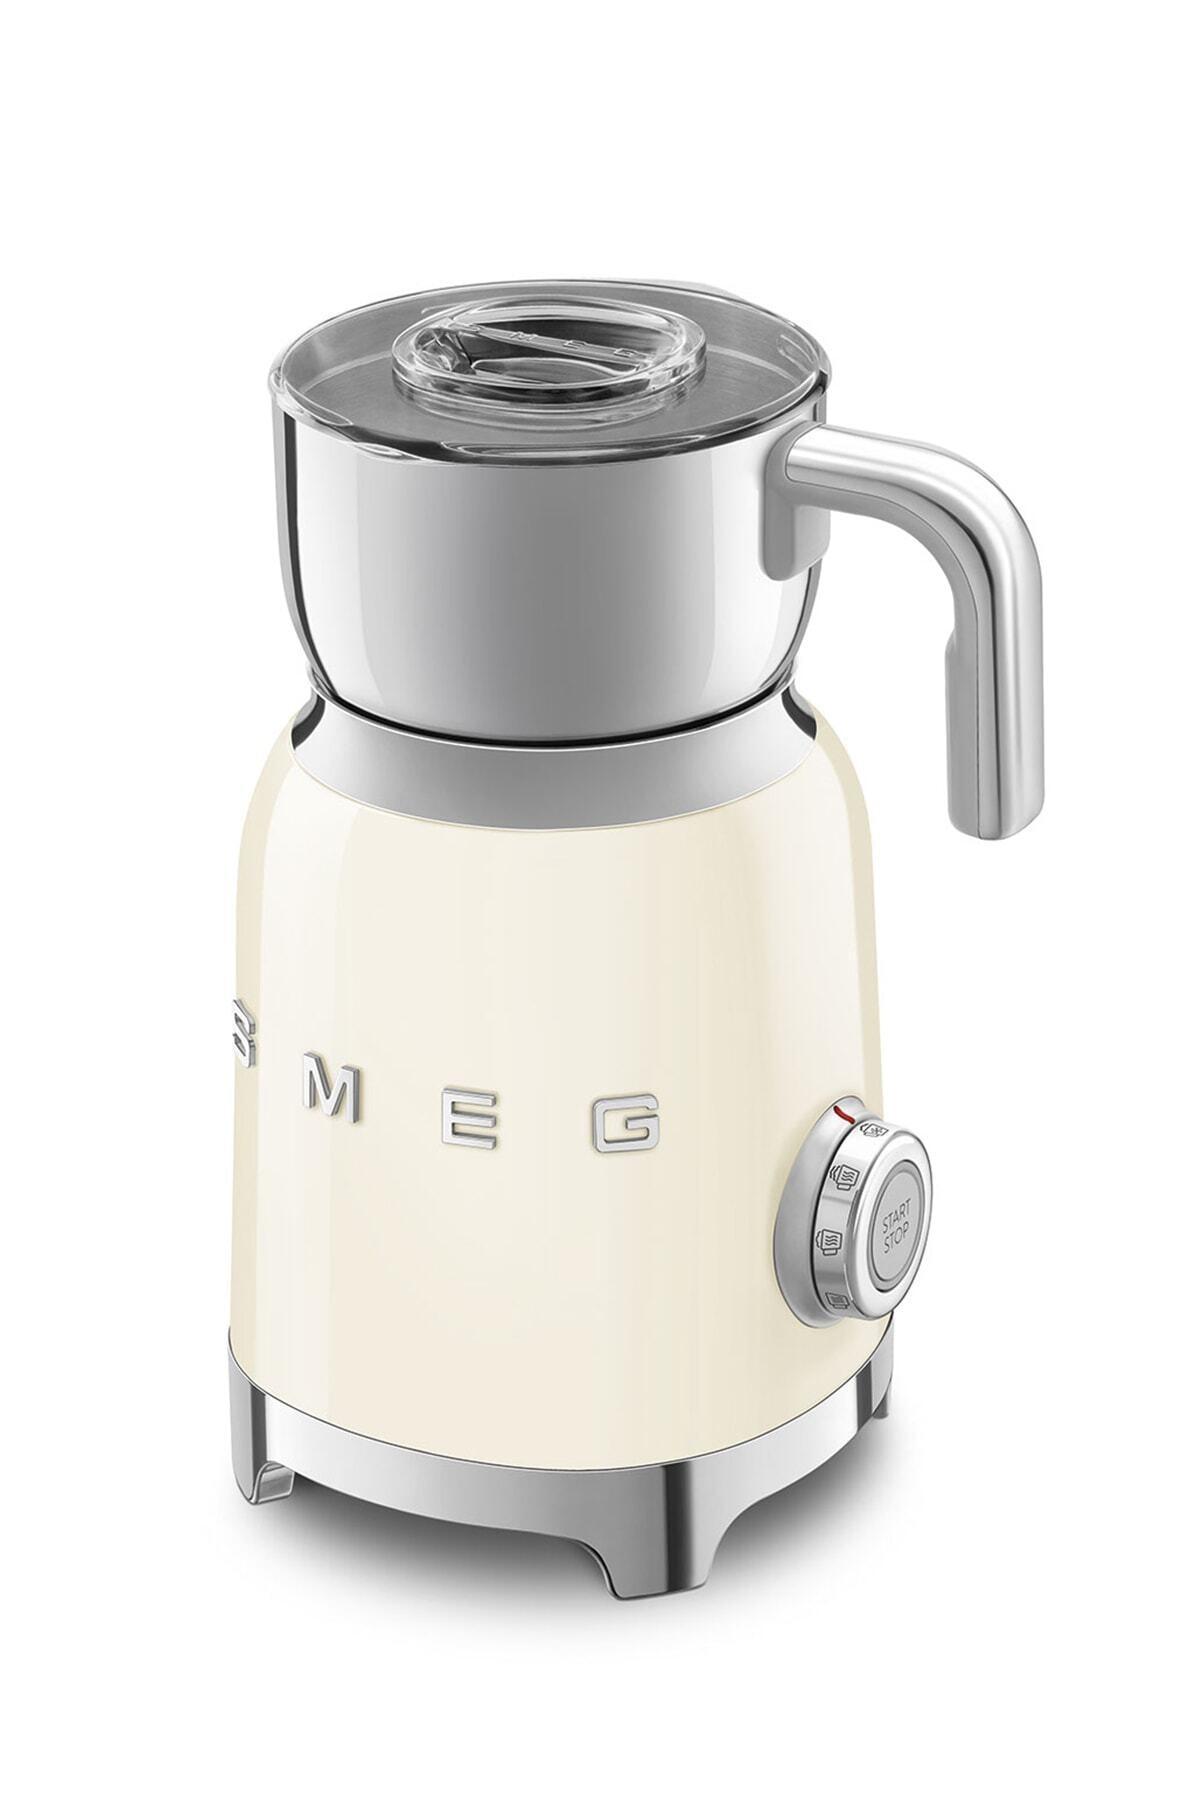 SMEG Mff01wheu Süt Köpürtme Makinesi Beyaz 1